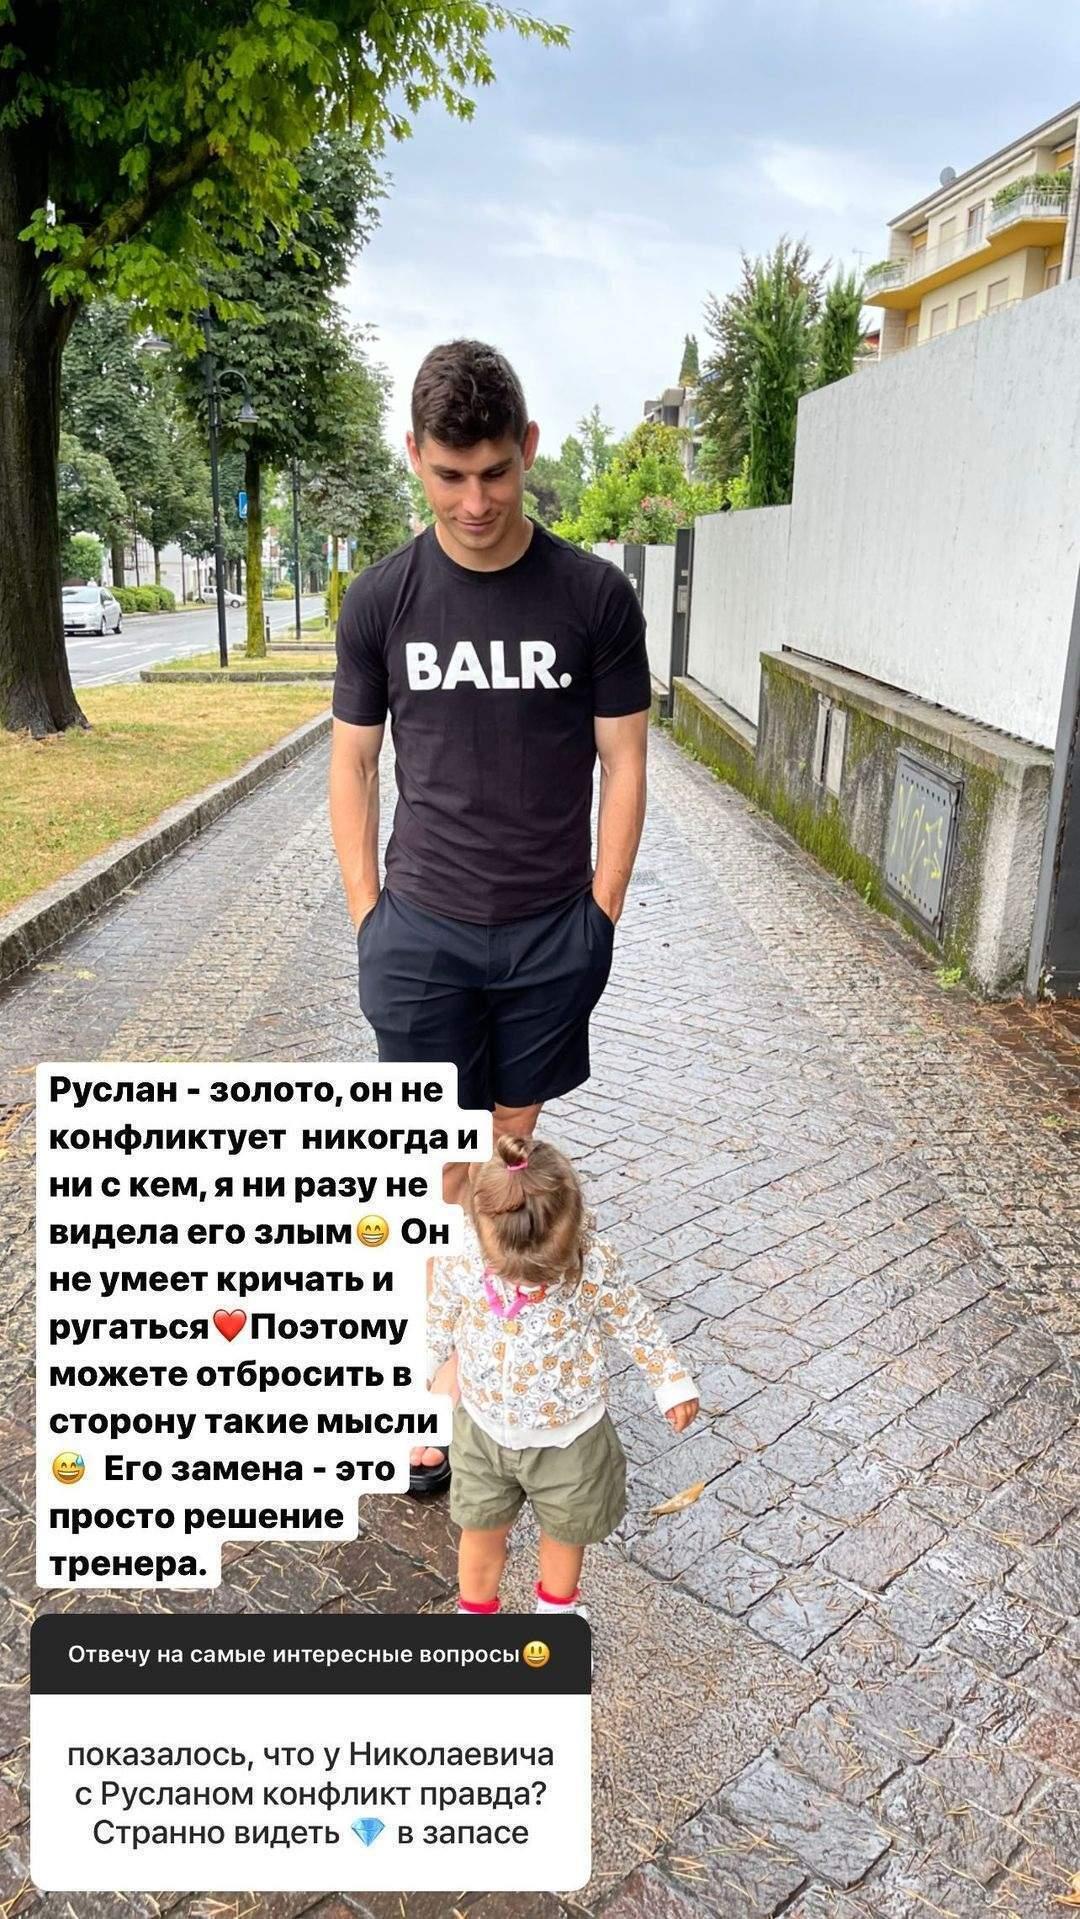 Жена украинского футболиста опровергла слухи о конфликте